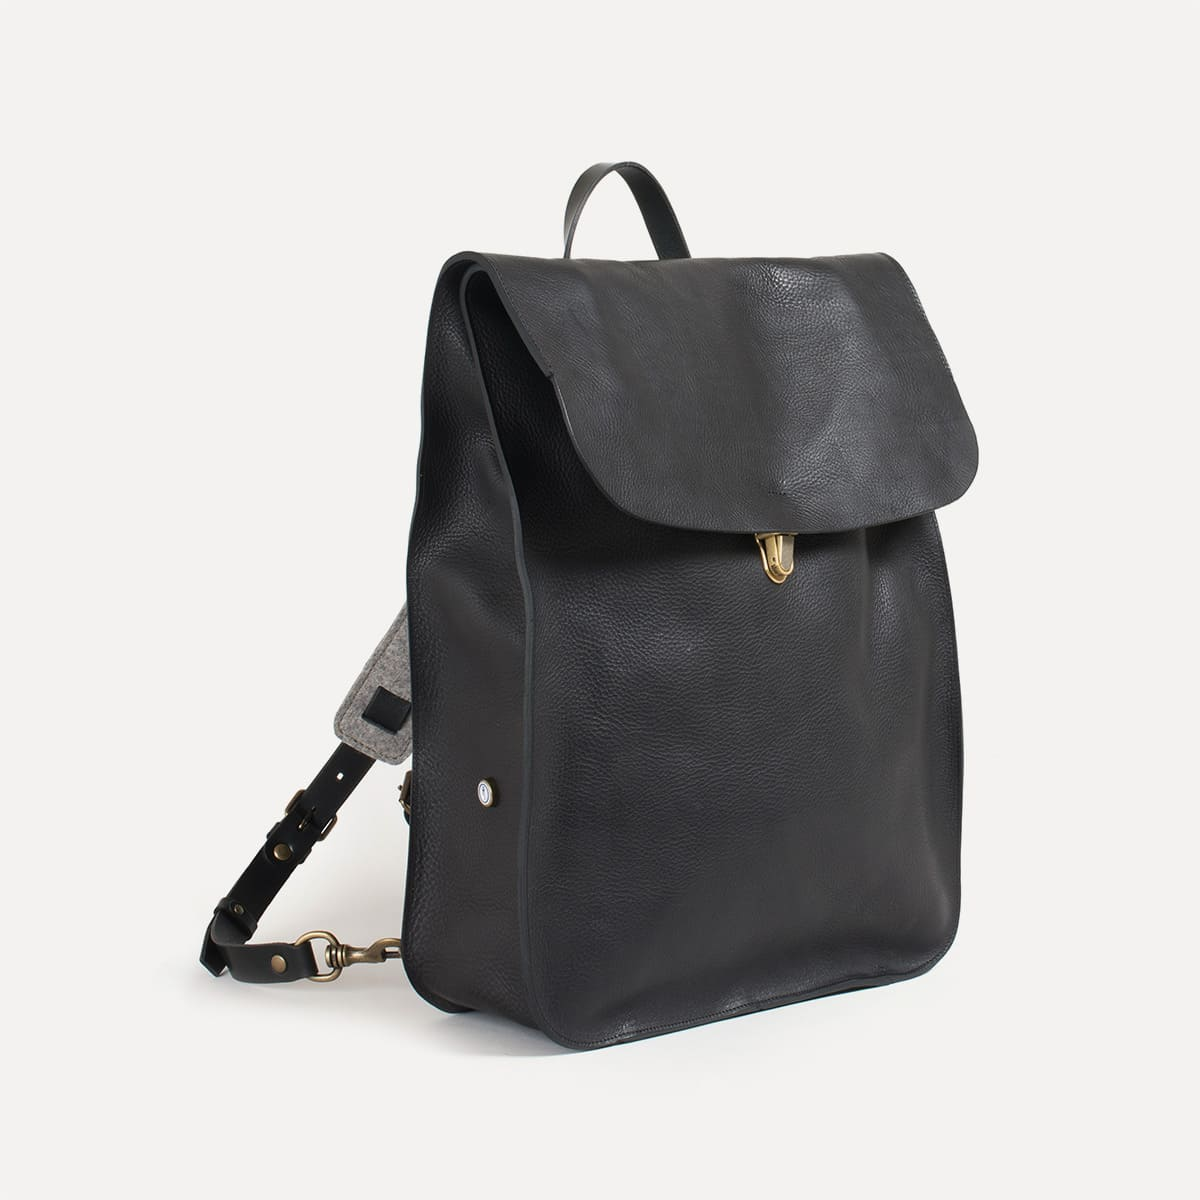 cf523087deb2 Arlo leather backpack I Vintage Rucksack